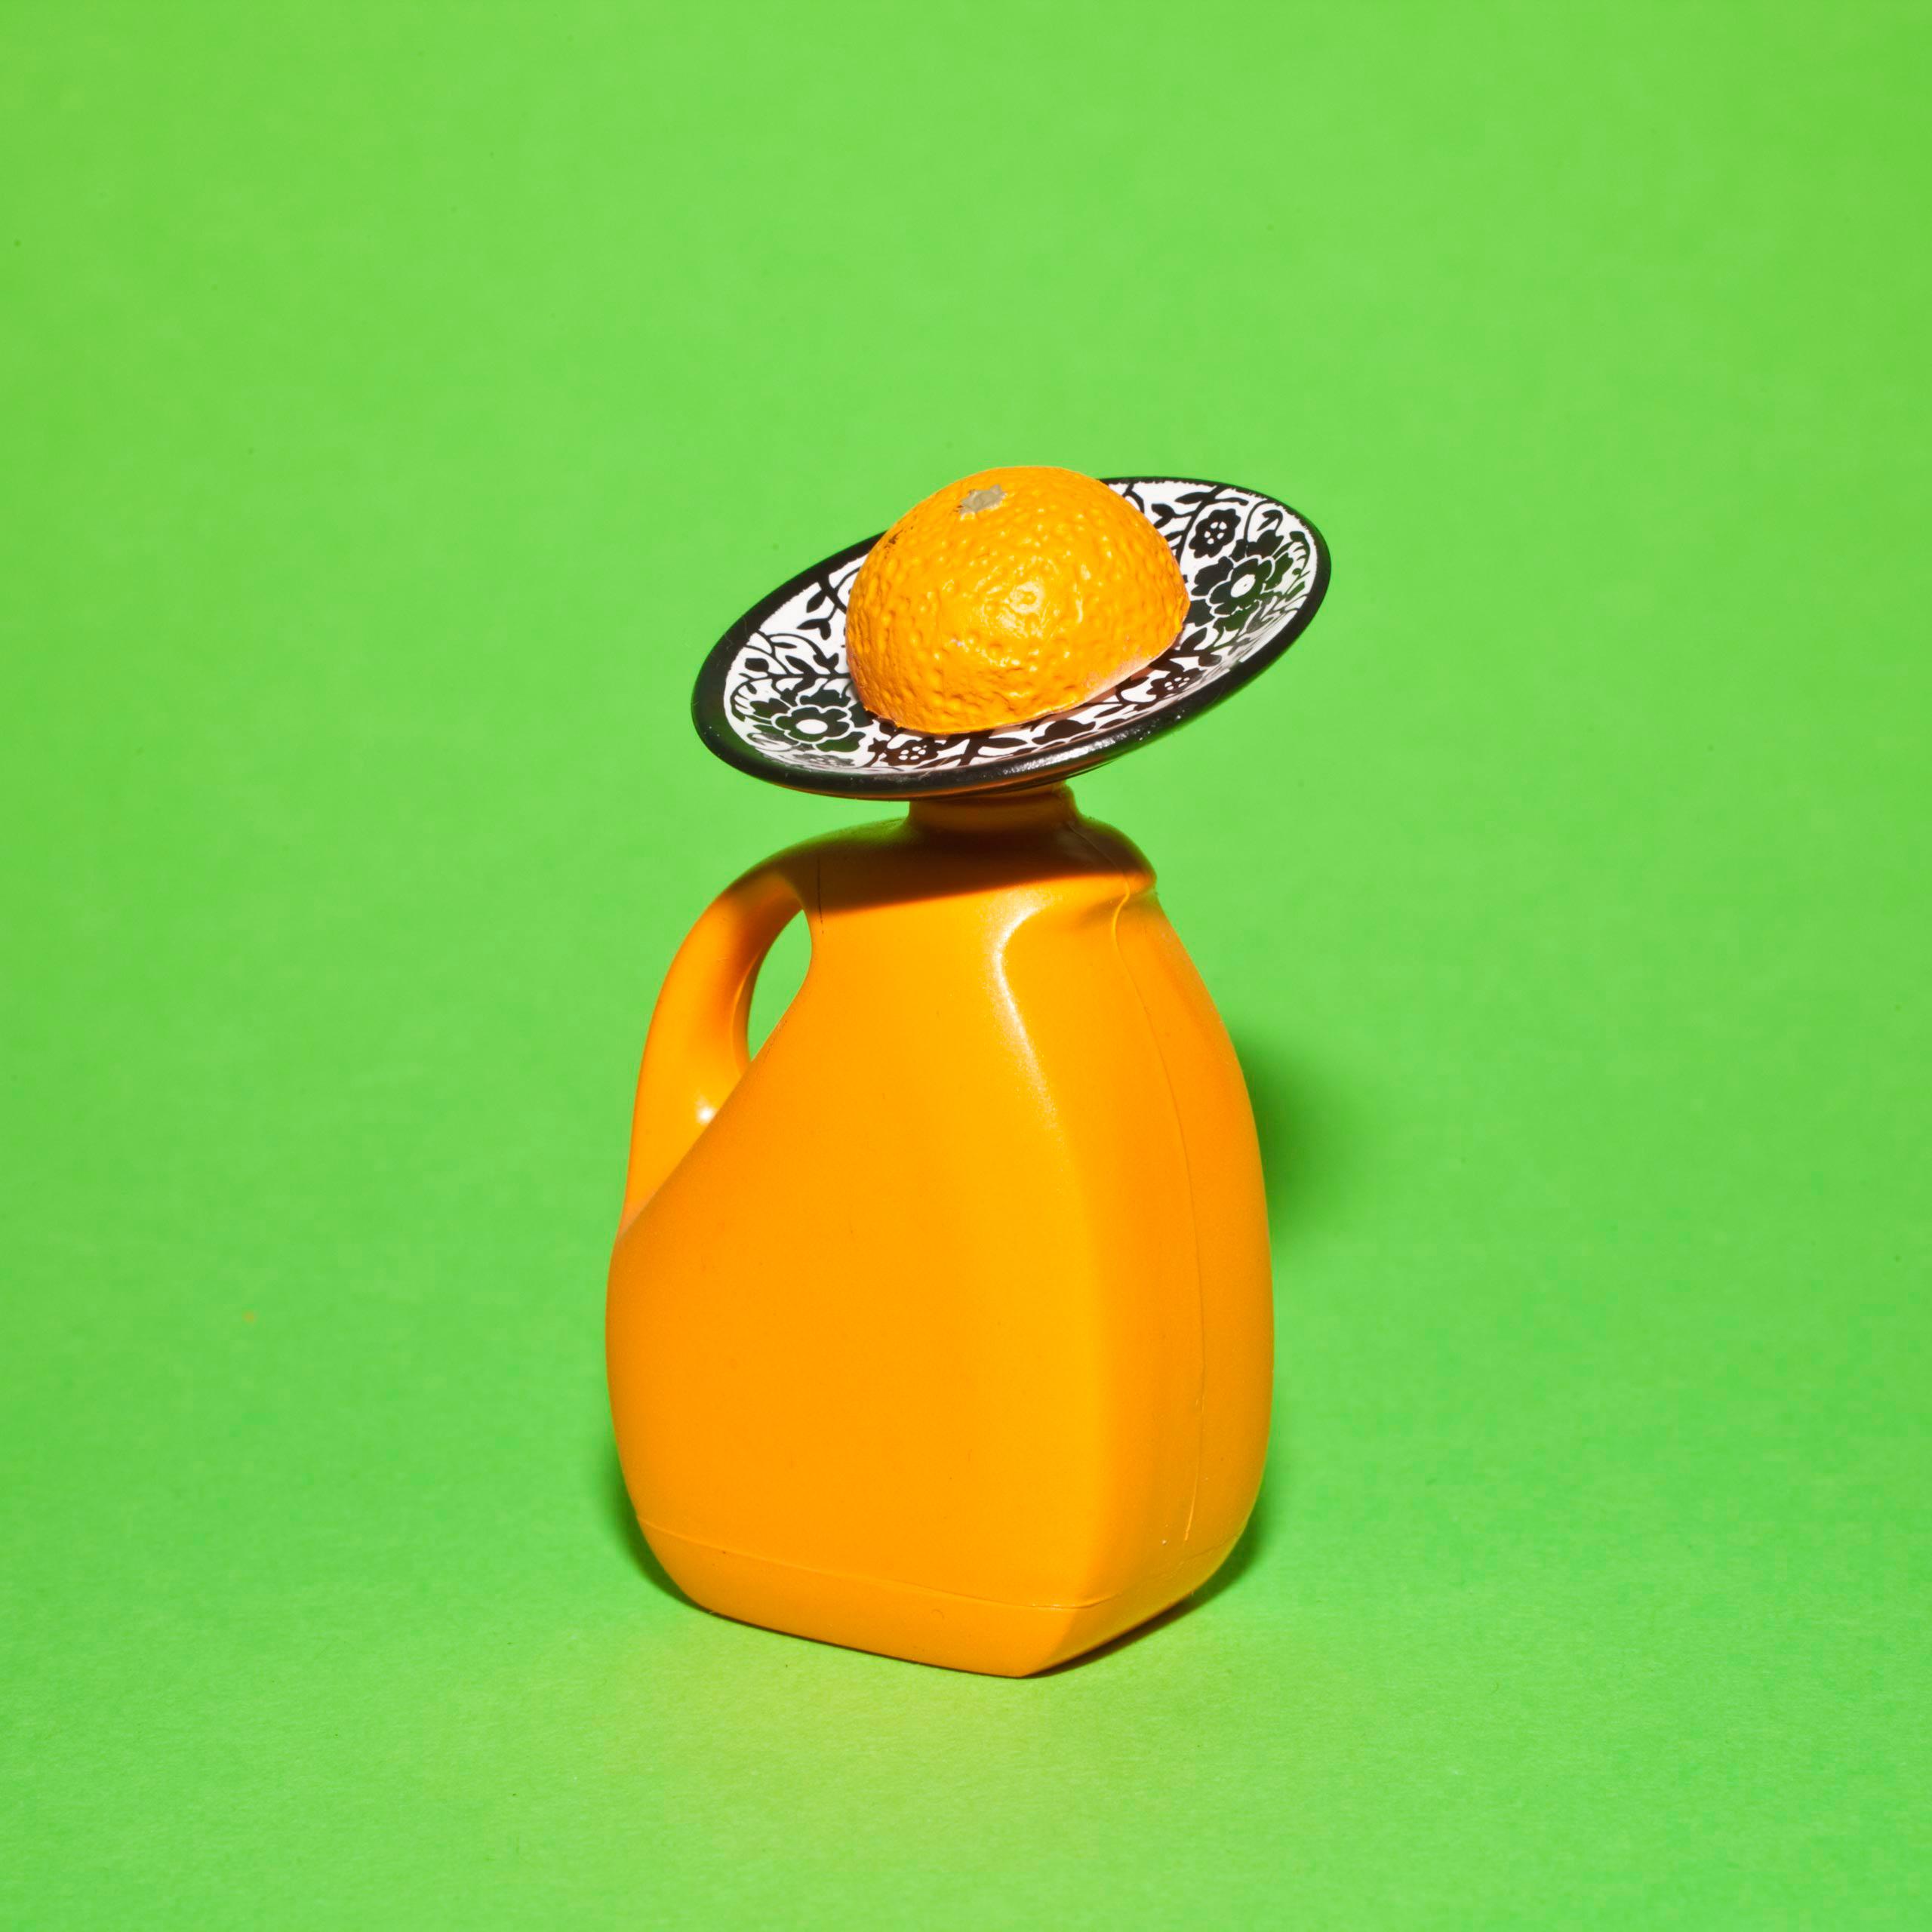 🍊 #jugo #zumo #orange #juice-o #thingsarequeer #オレンジ #ジュース